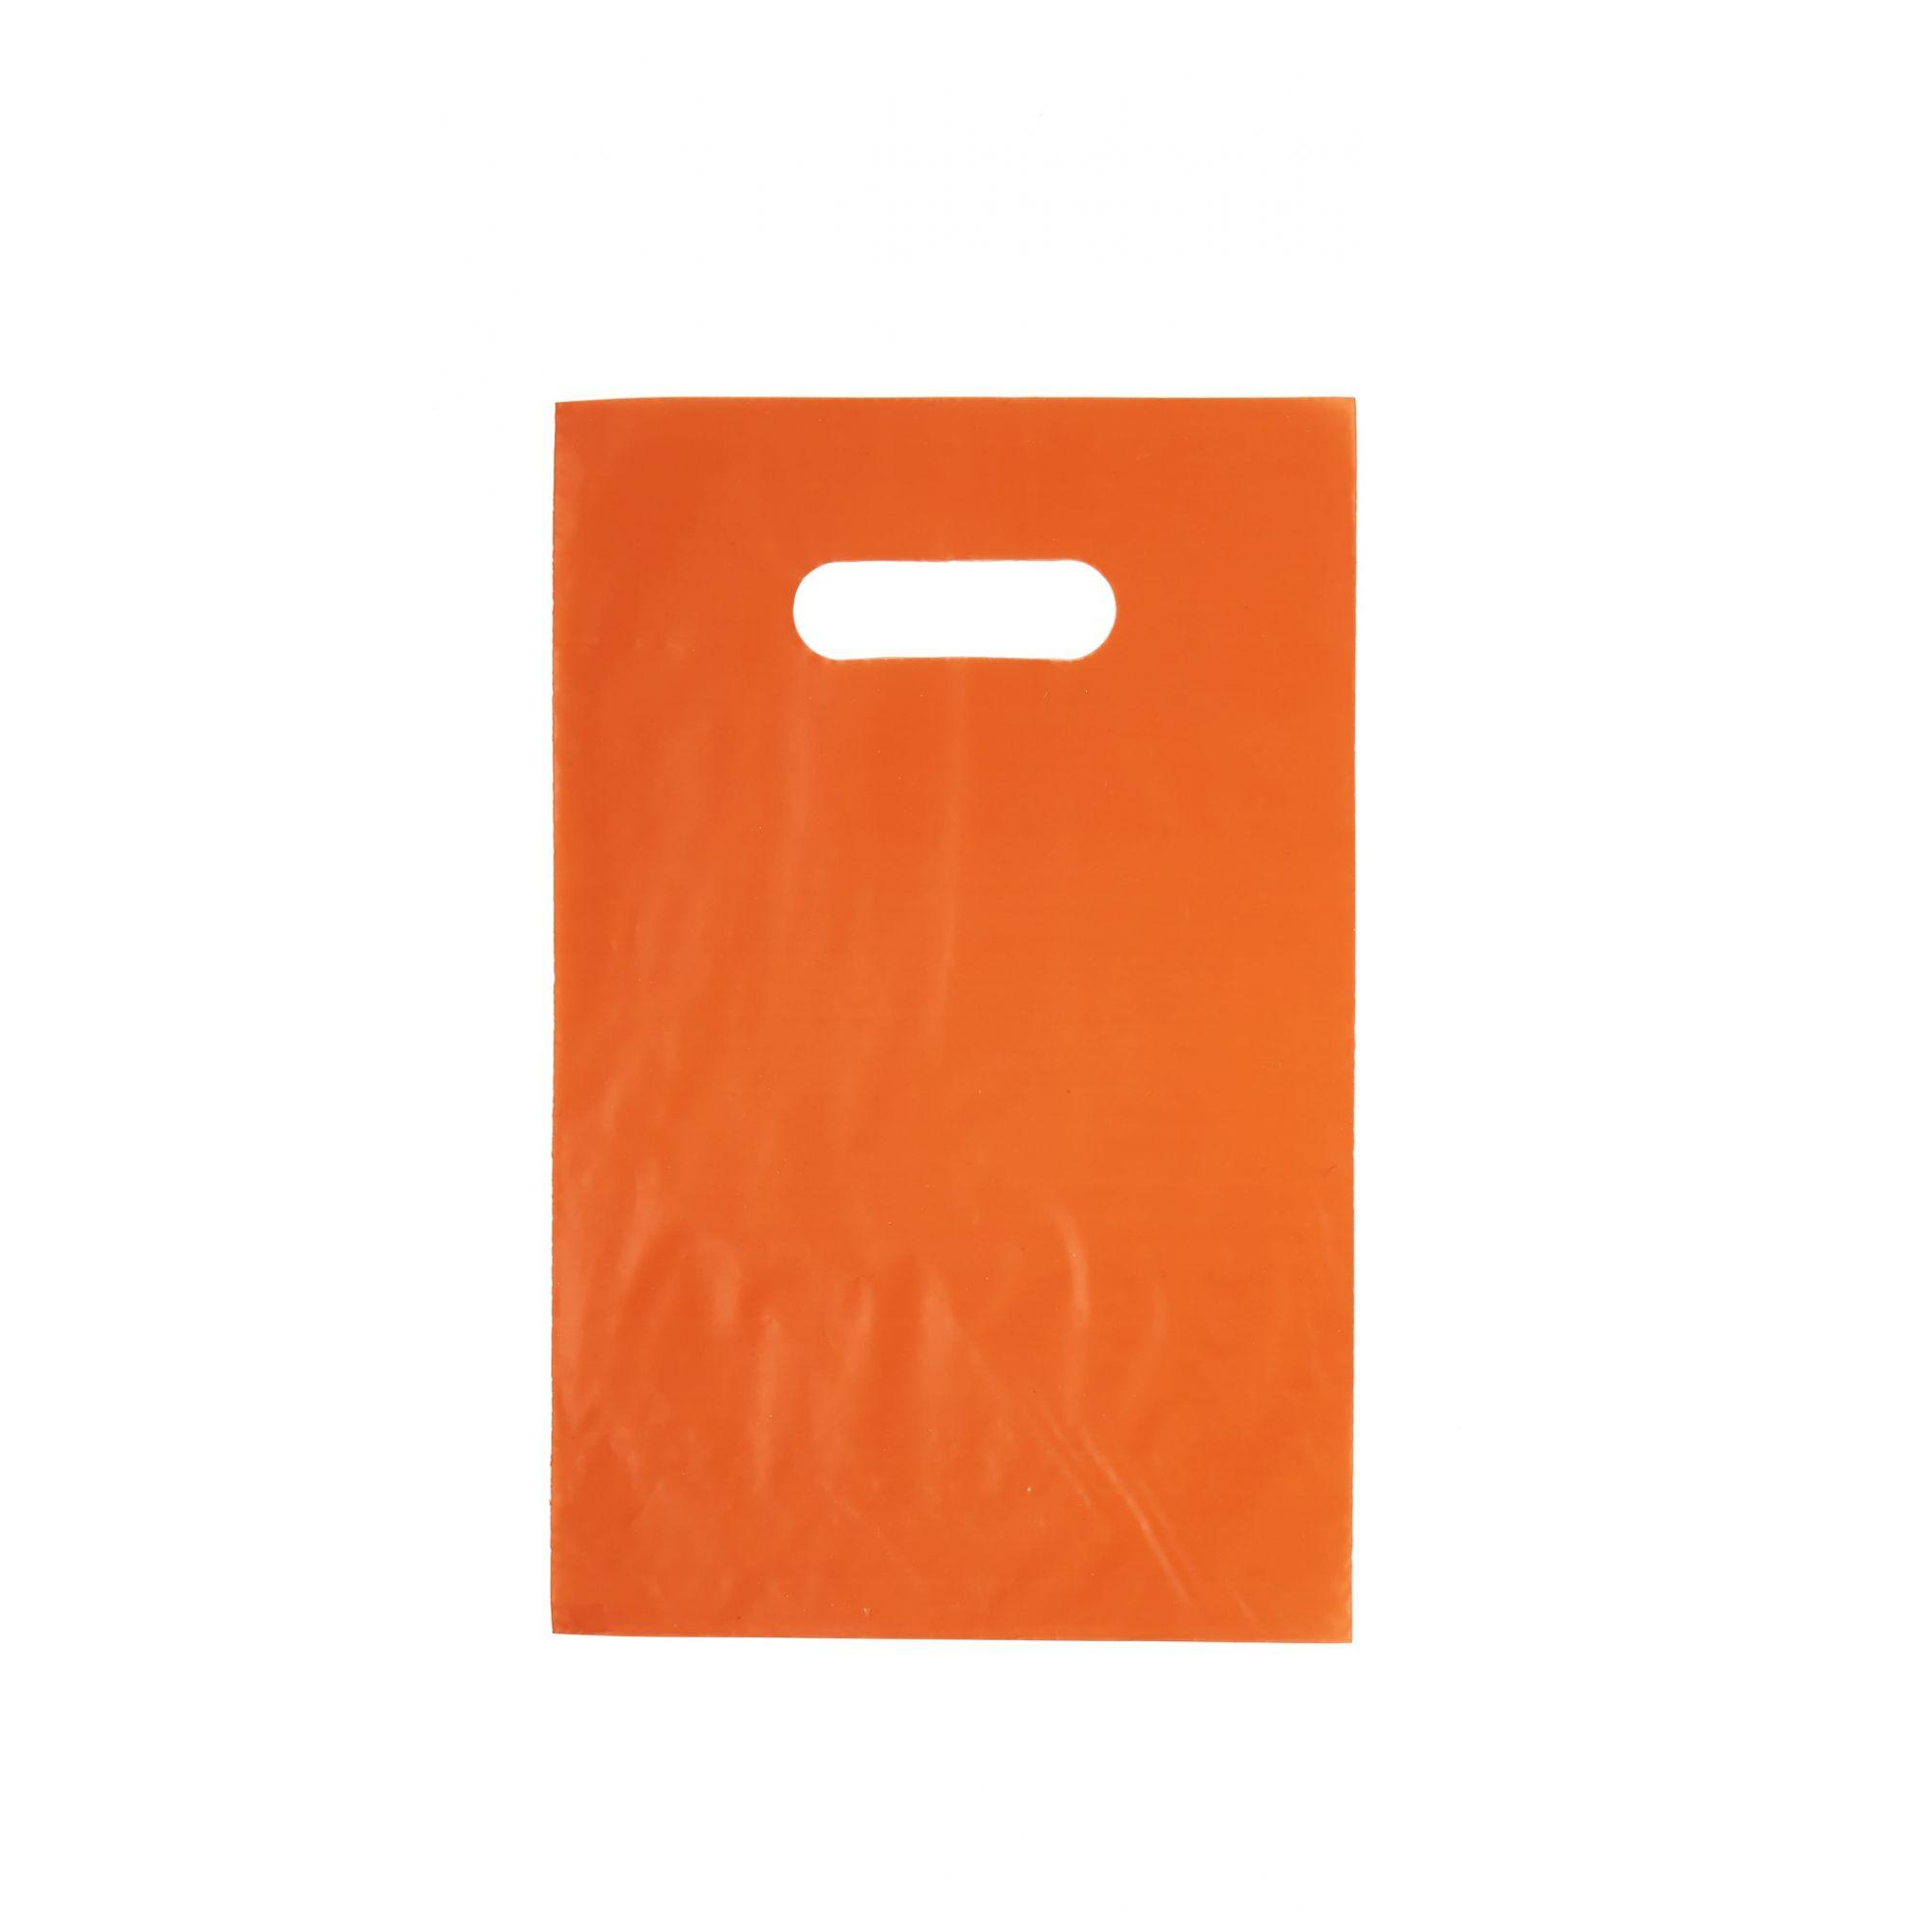 Sacola Plástica 25x35 Laranja - Alça Boca de Palhaço